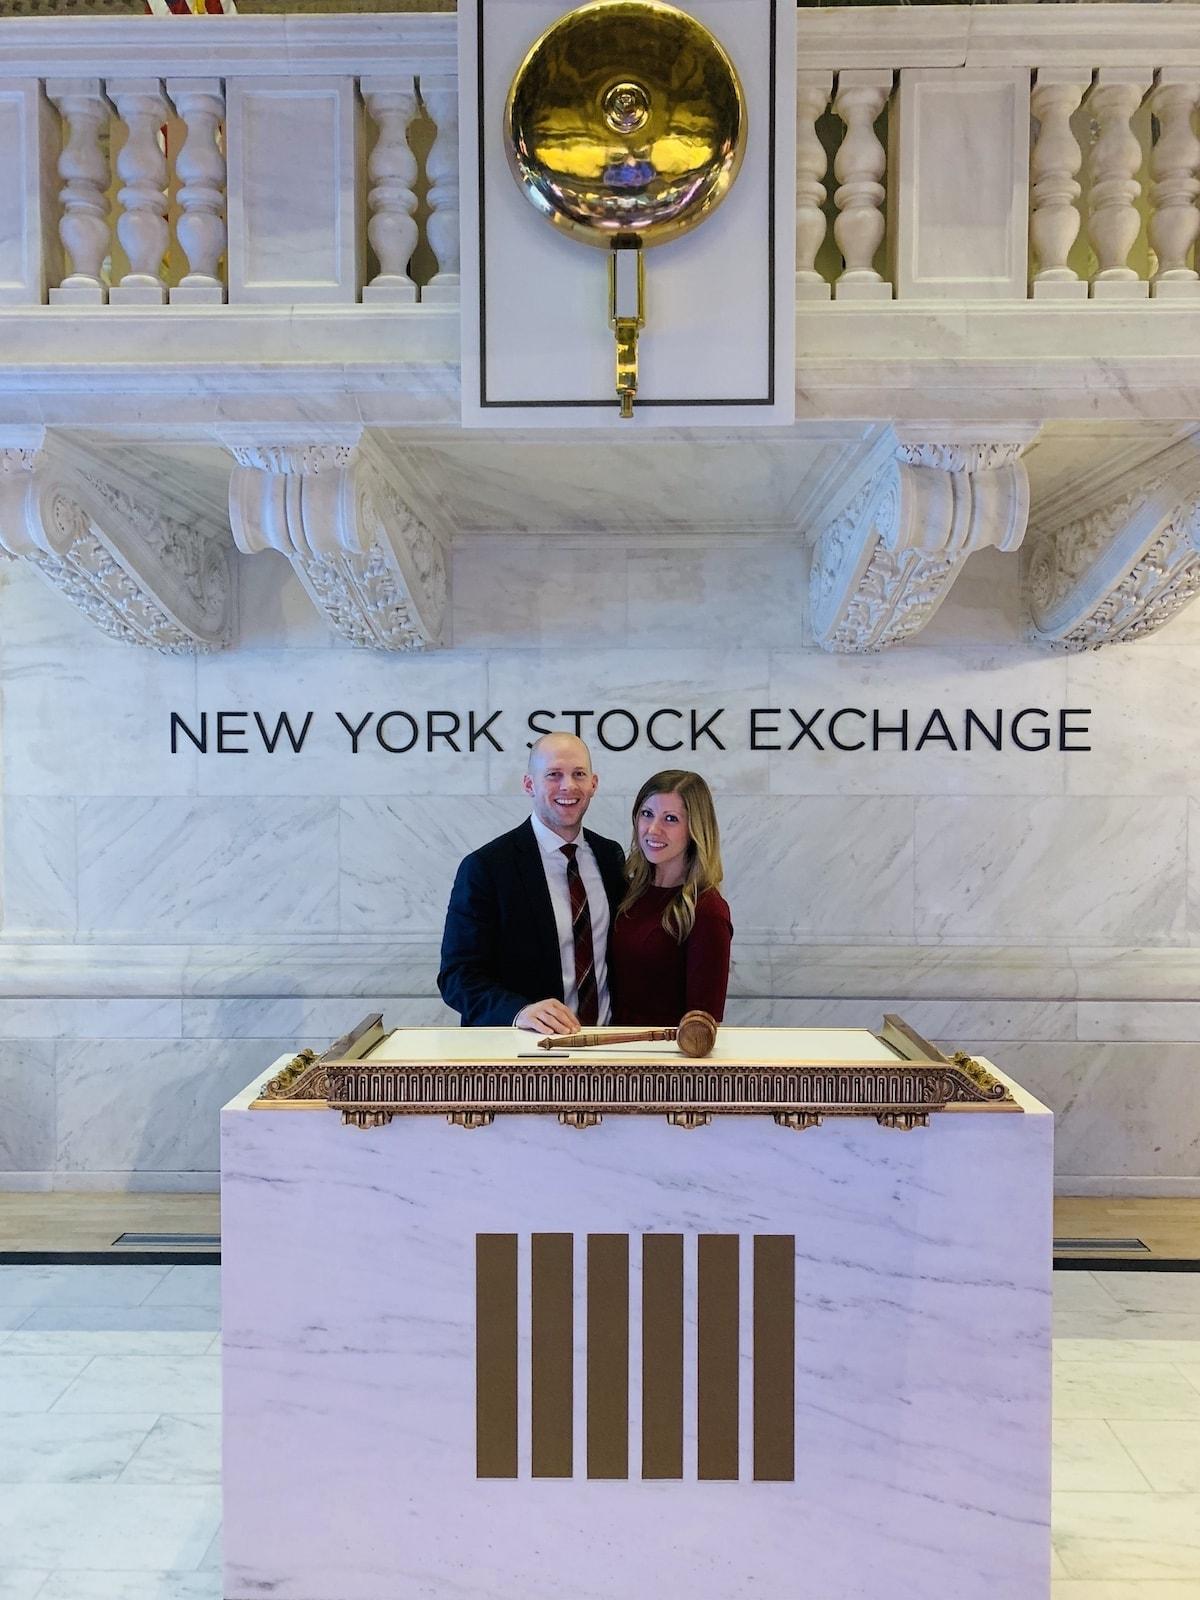 Lauren and Gordon and the New York Stock Exchange